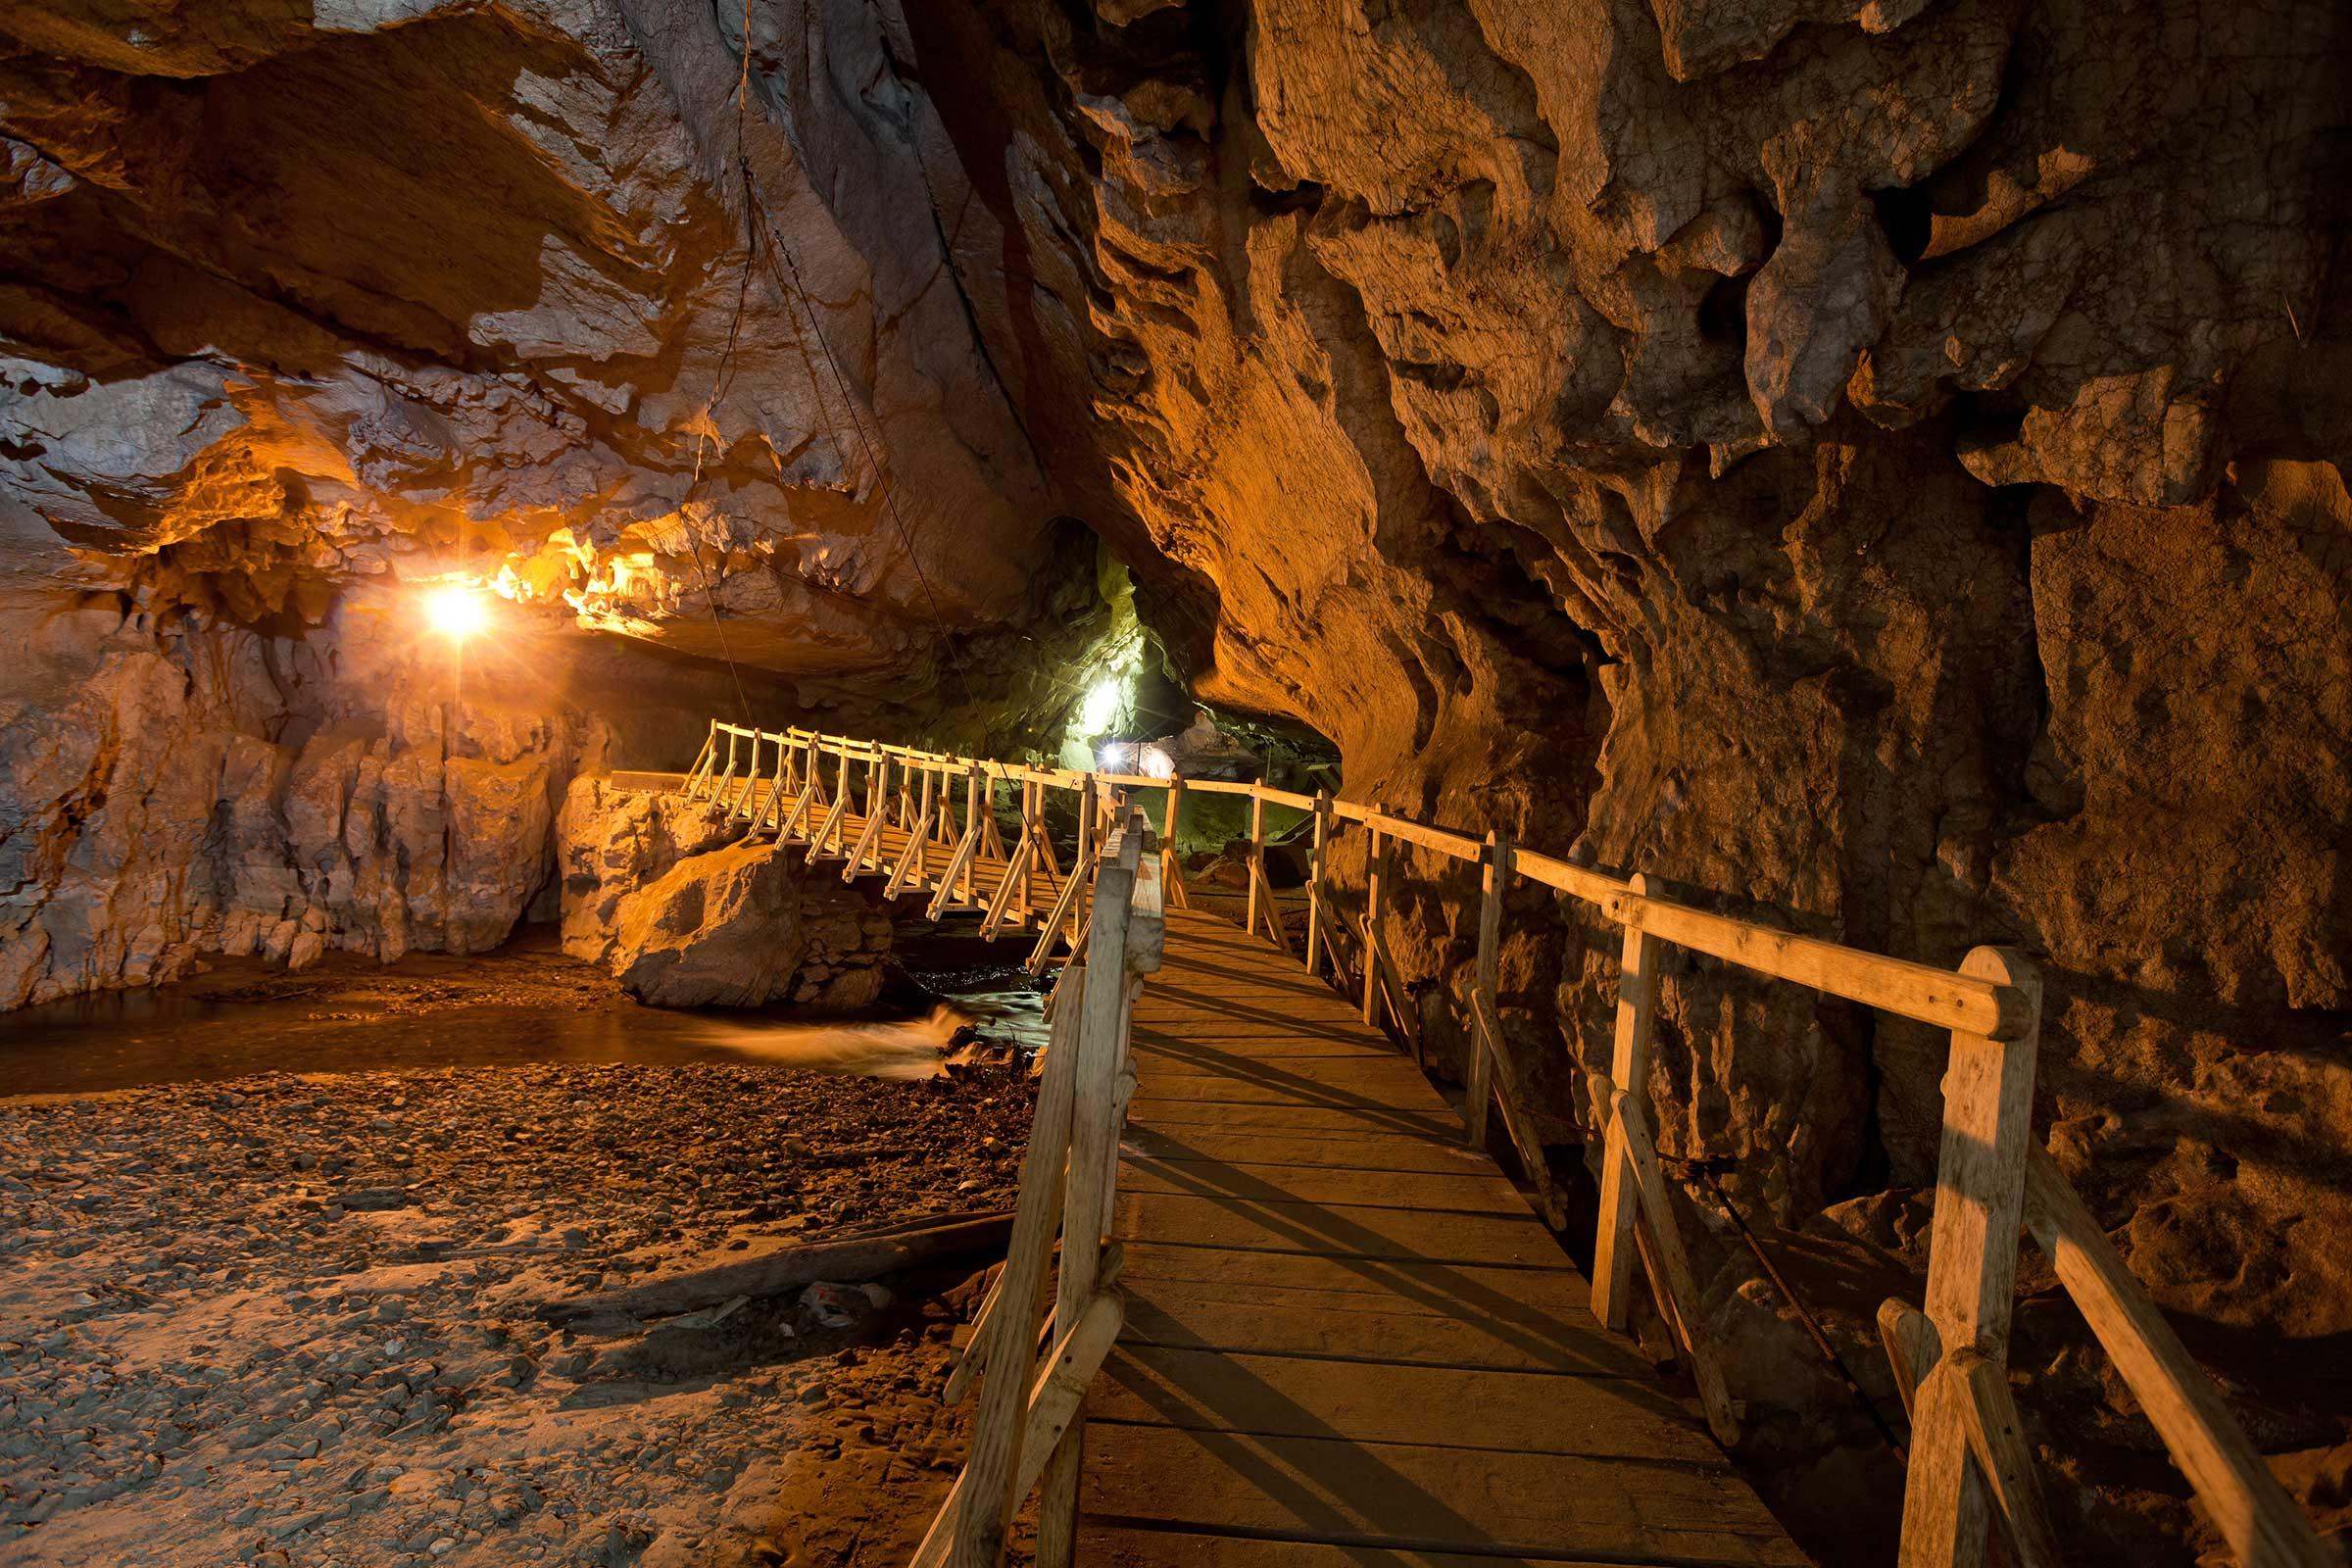 Pod de lemn in Pestera Bolii -Petrosani